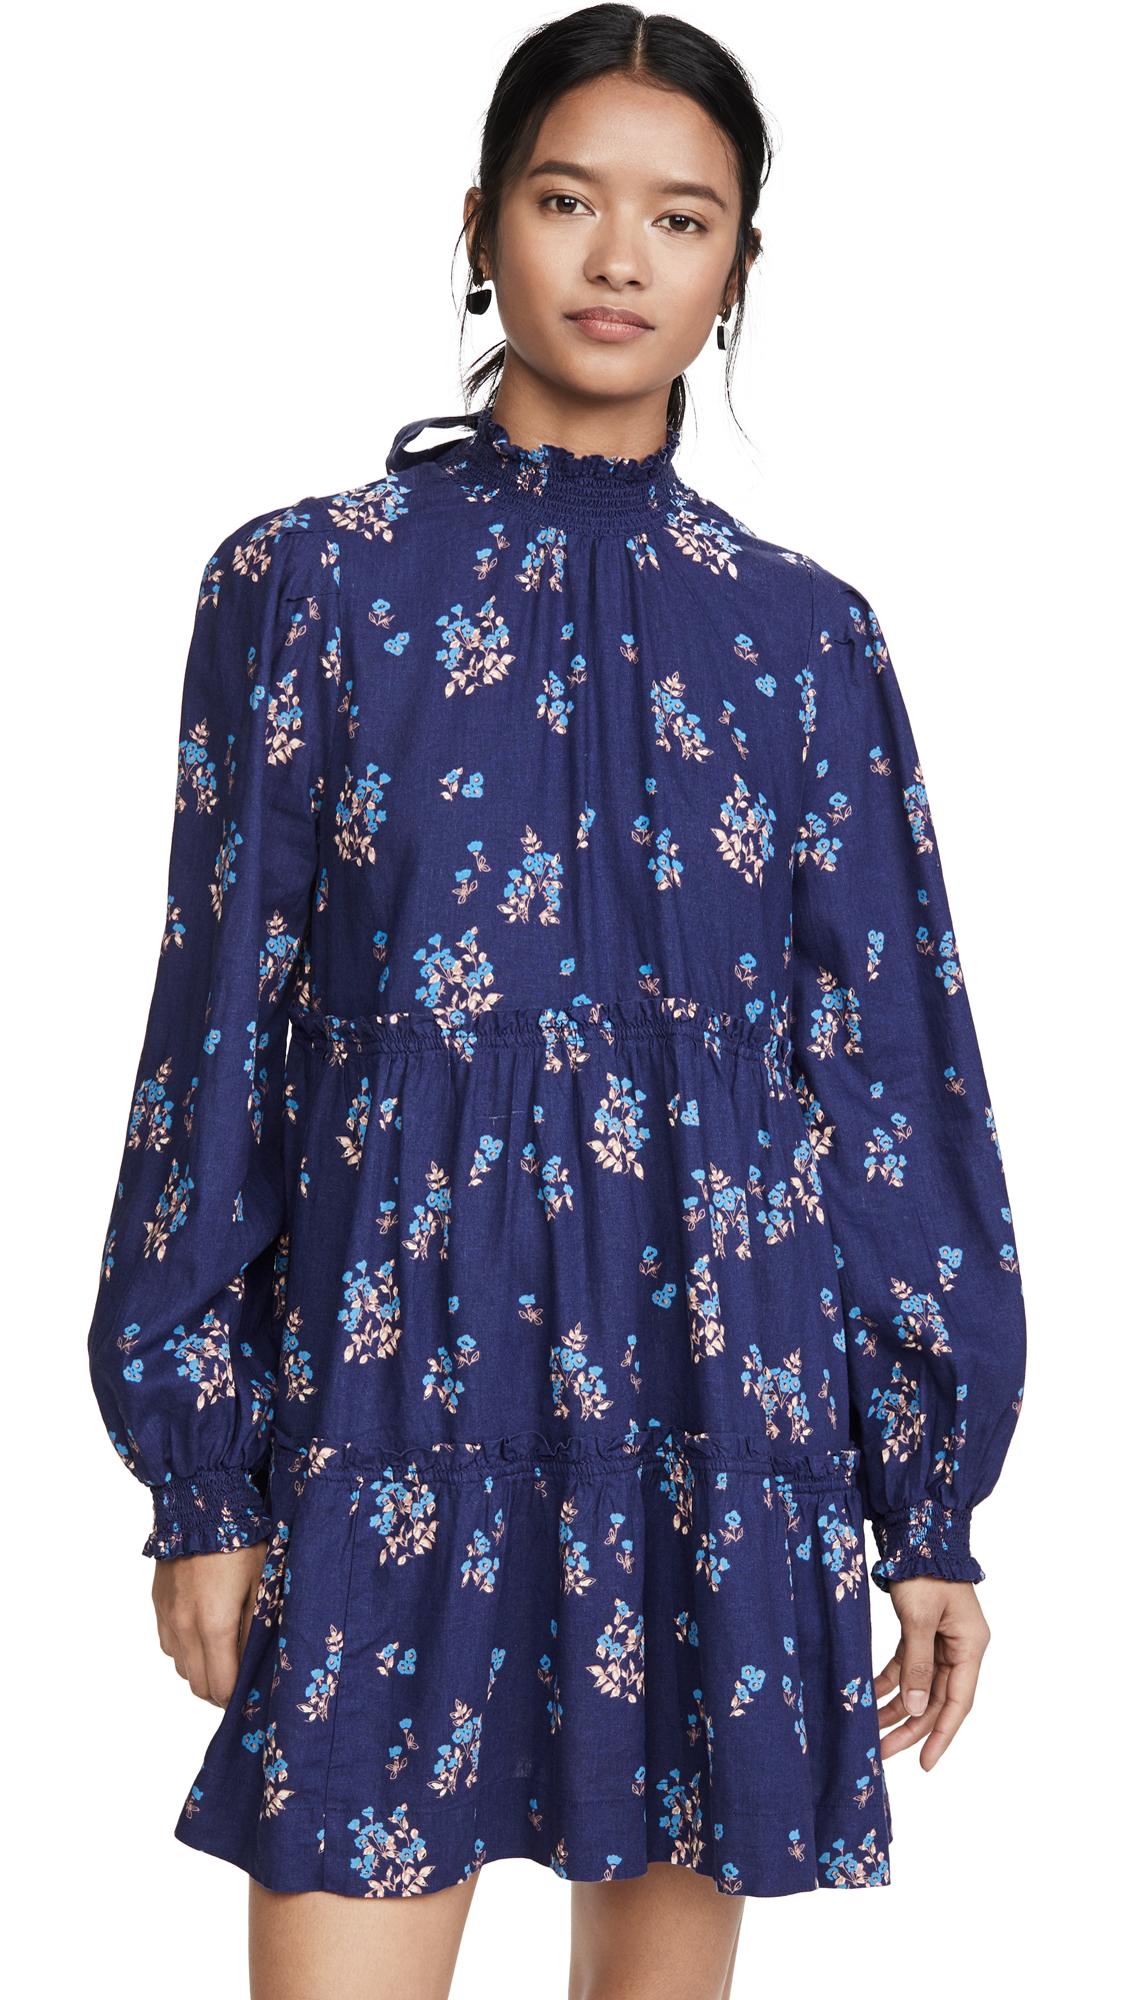 Free People Petit Fours Mini Dress – 30% Off Sale